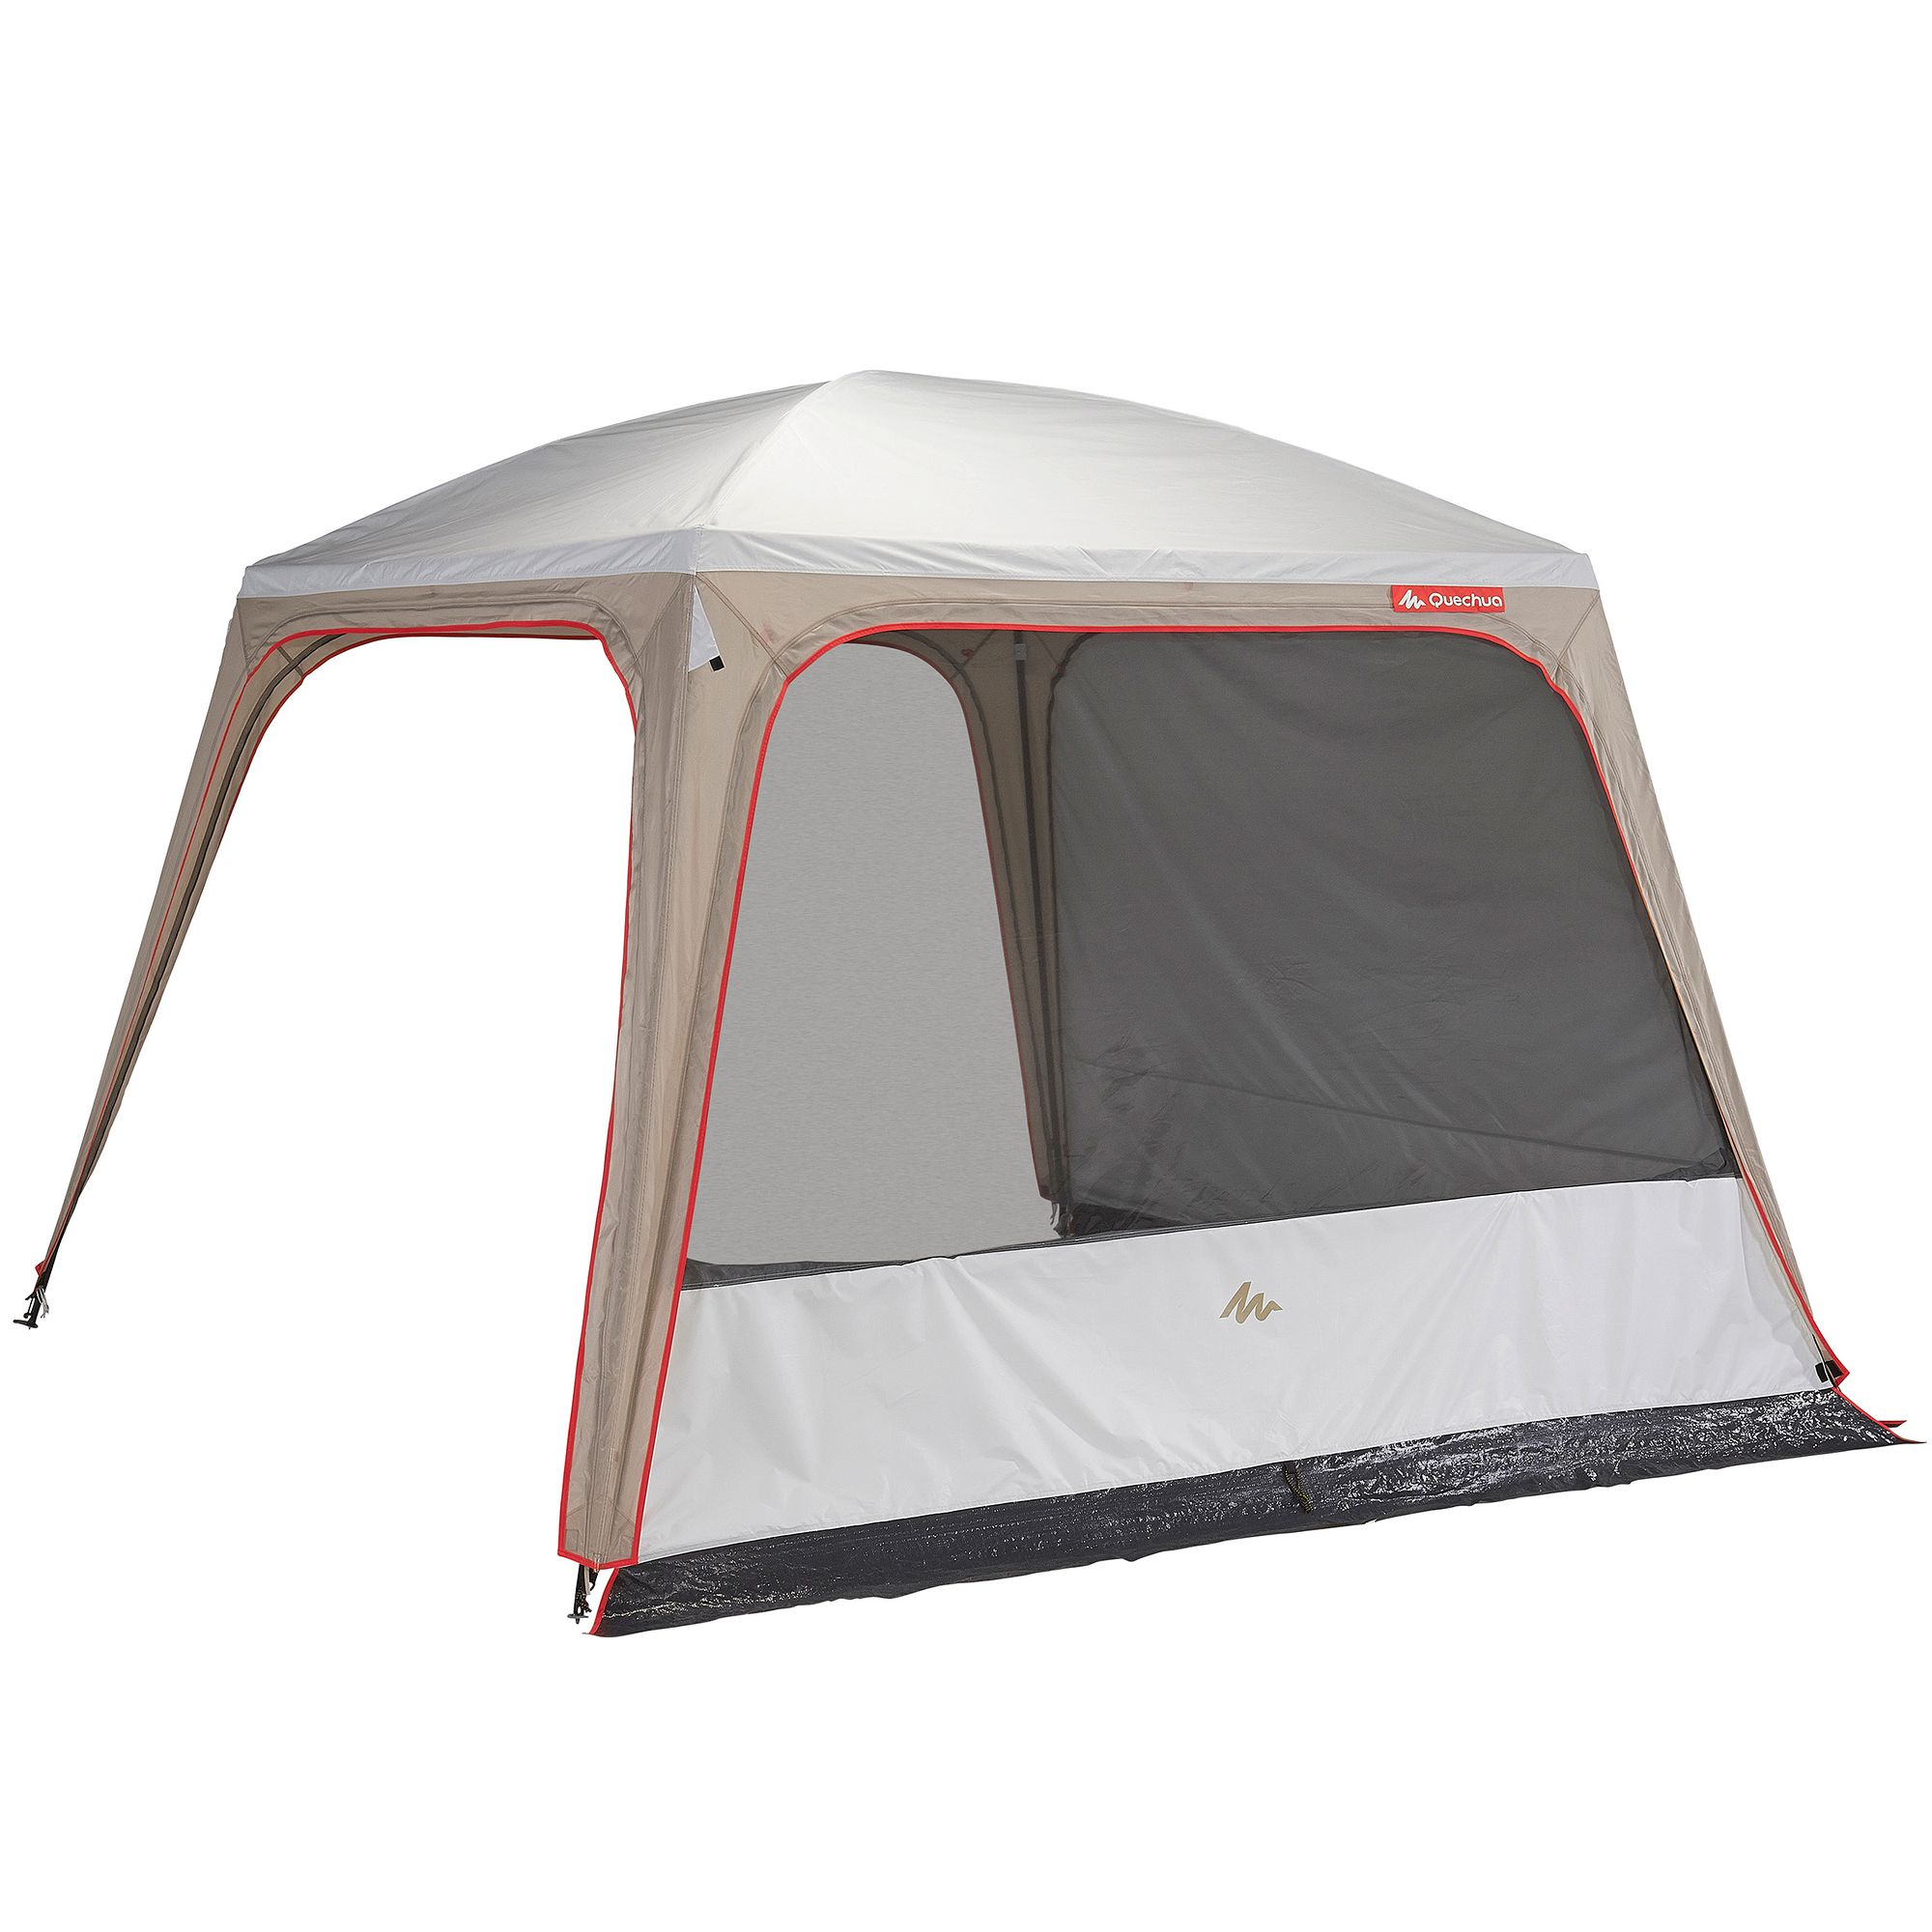 Sejour a portes camping camp arpenaz 3x3 10 pers upf50 for Carpas plegables decathlon